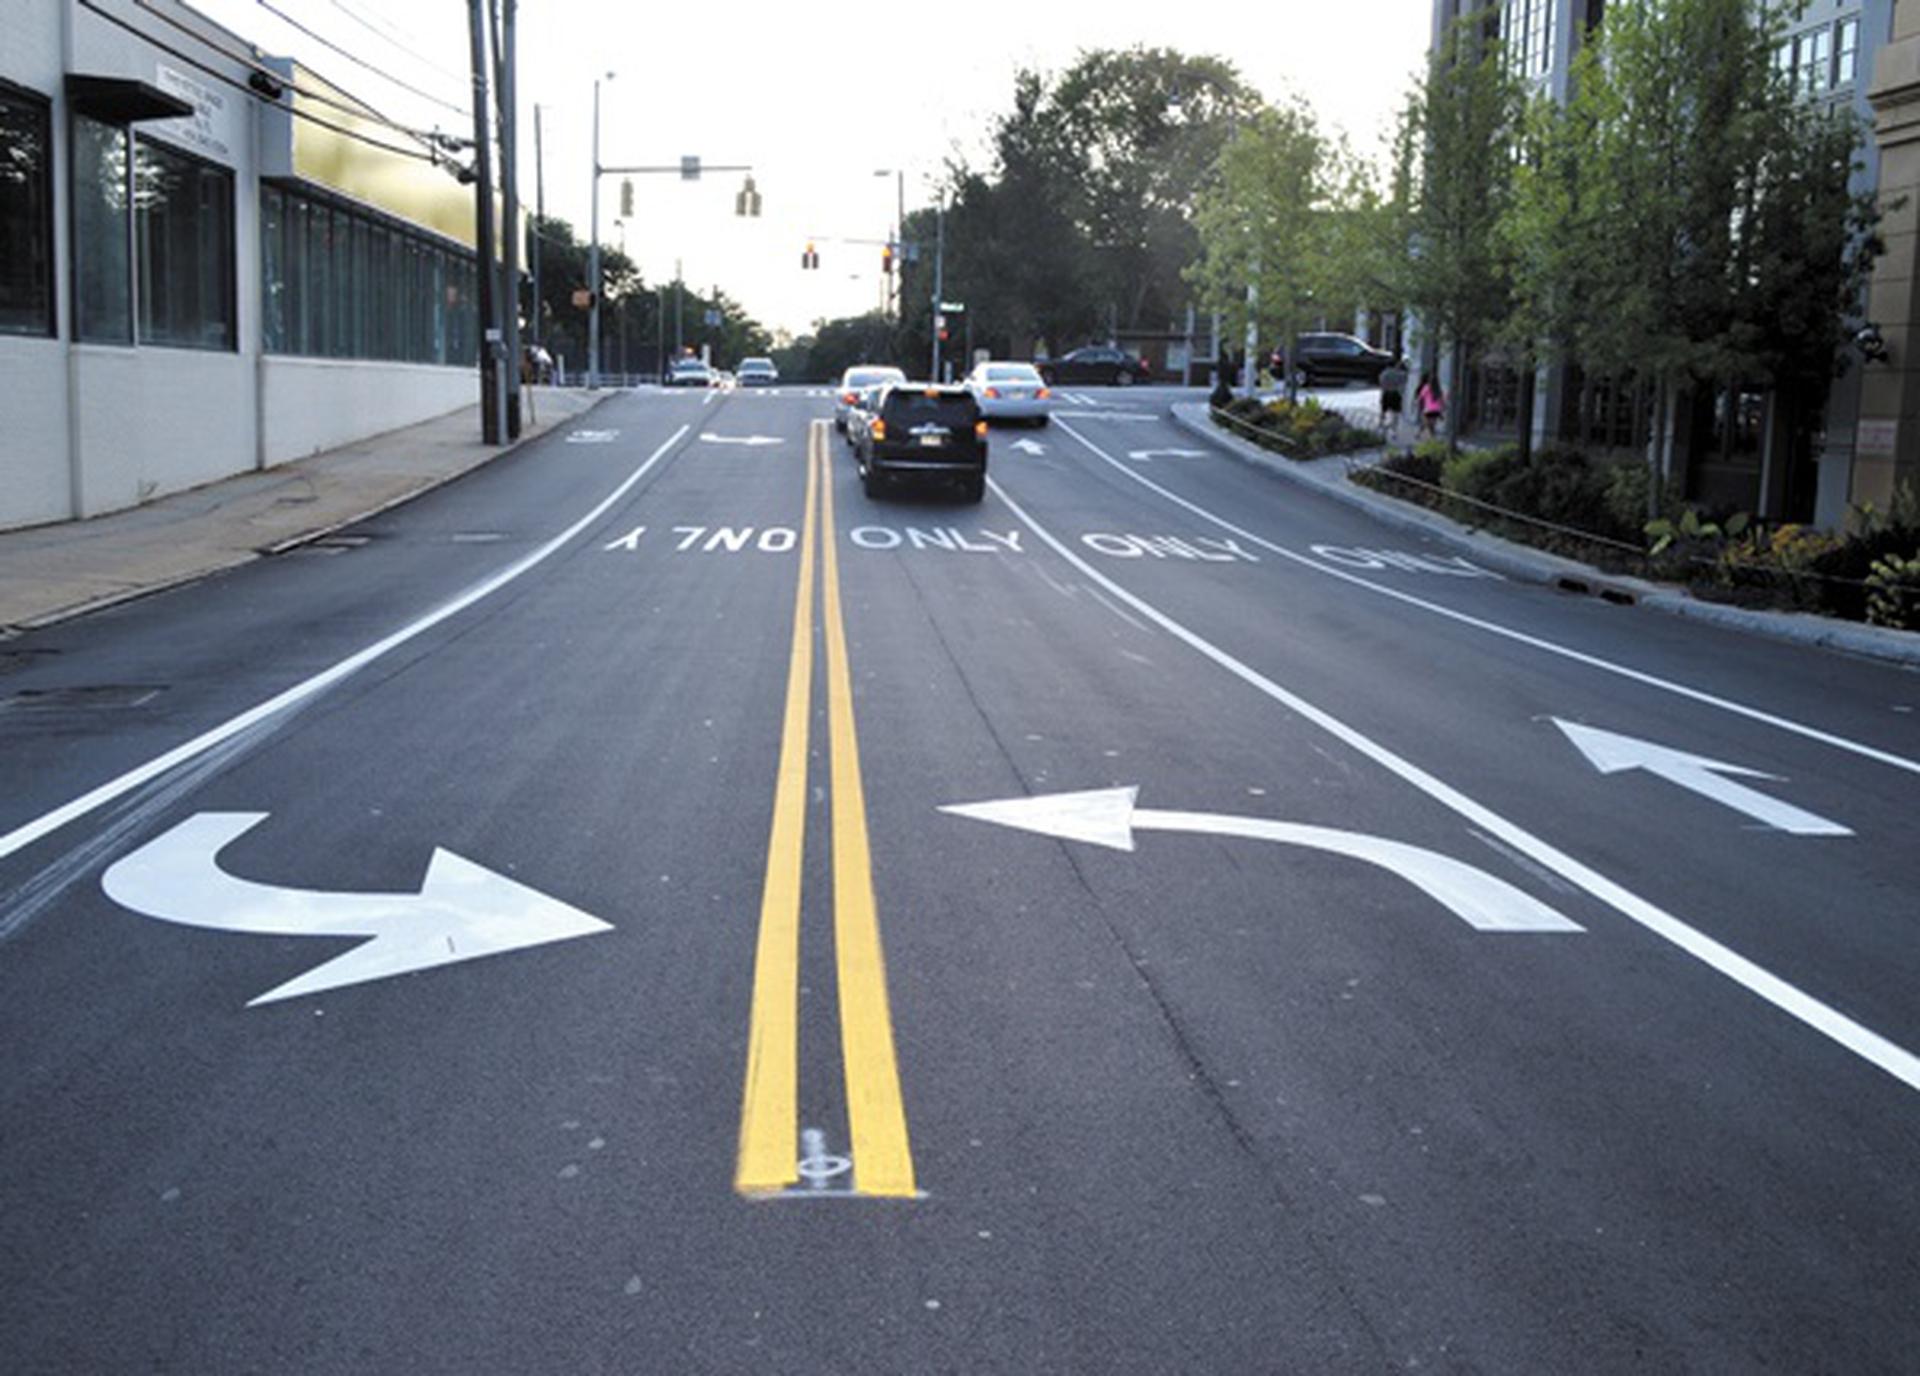 Standard Road Line Markings